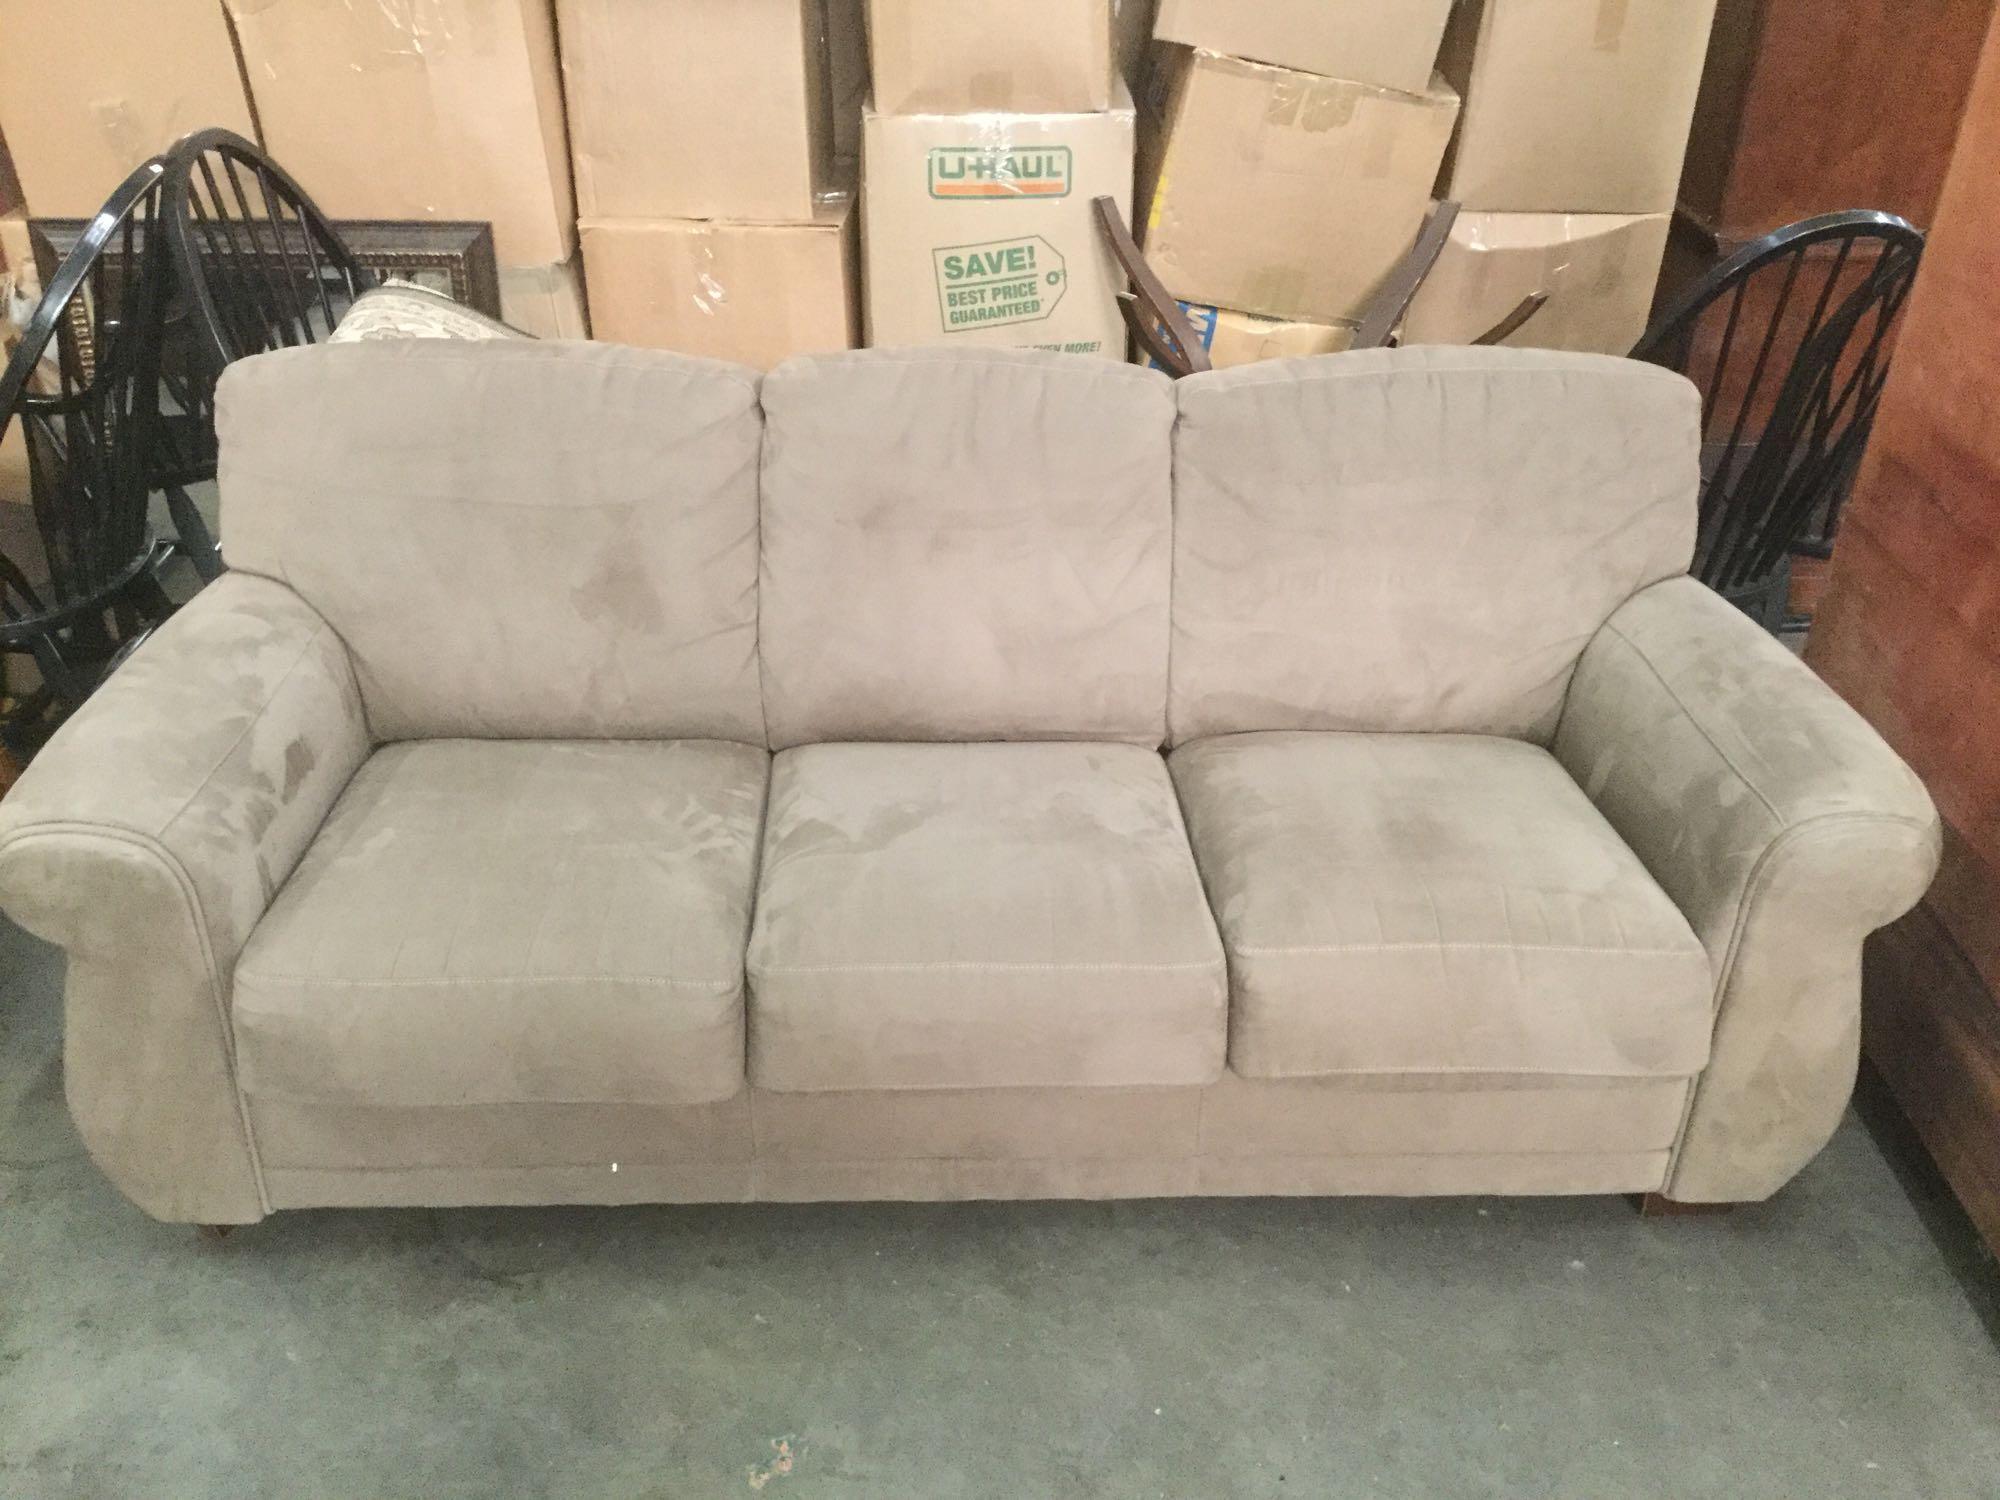 robinson co modern microfiber couch